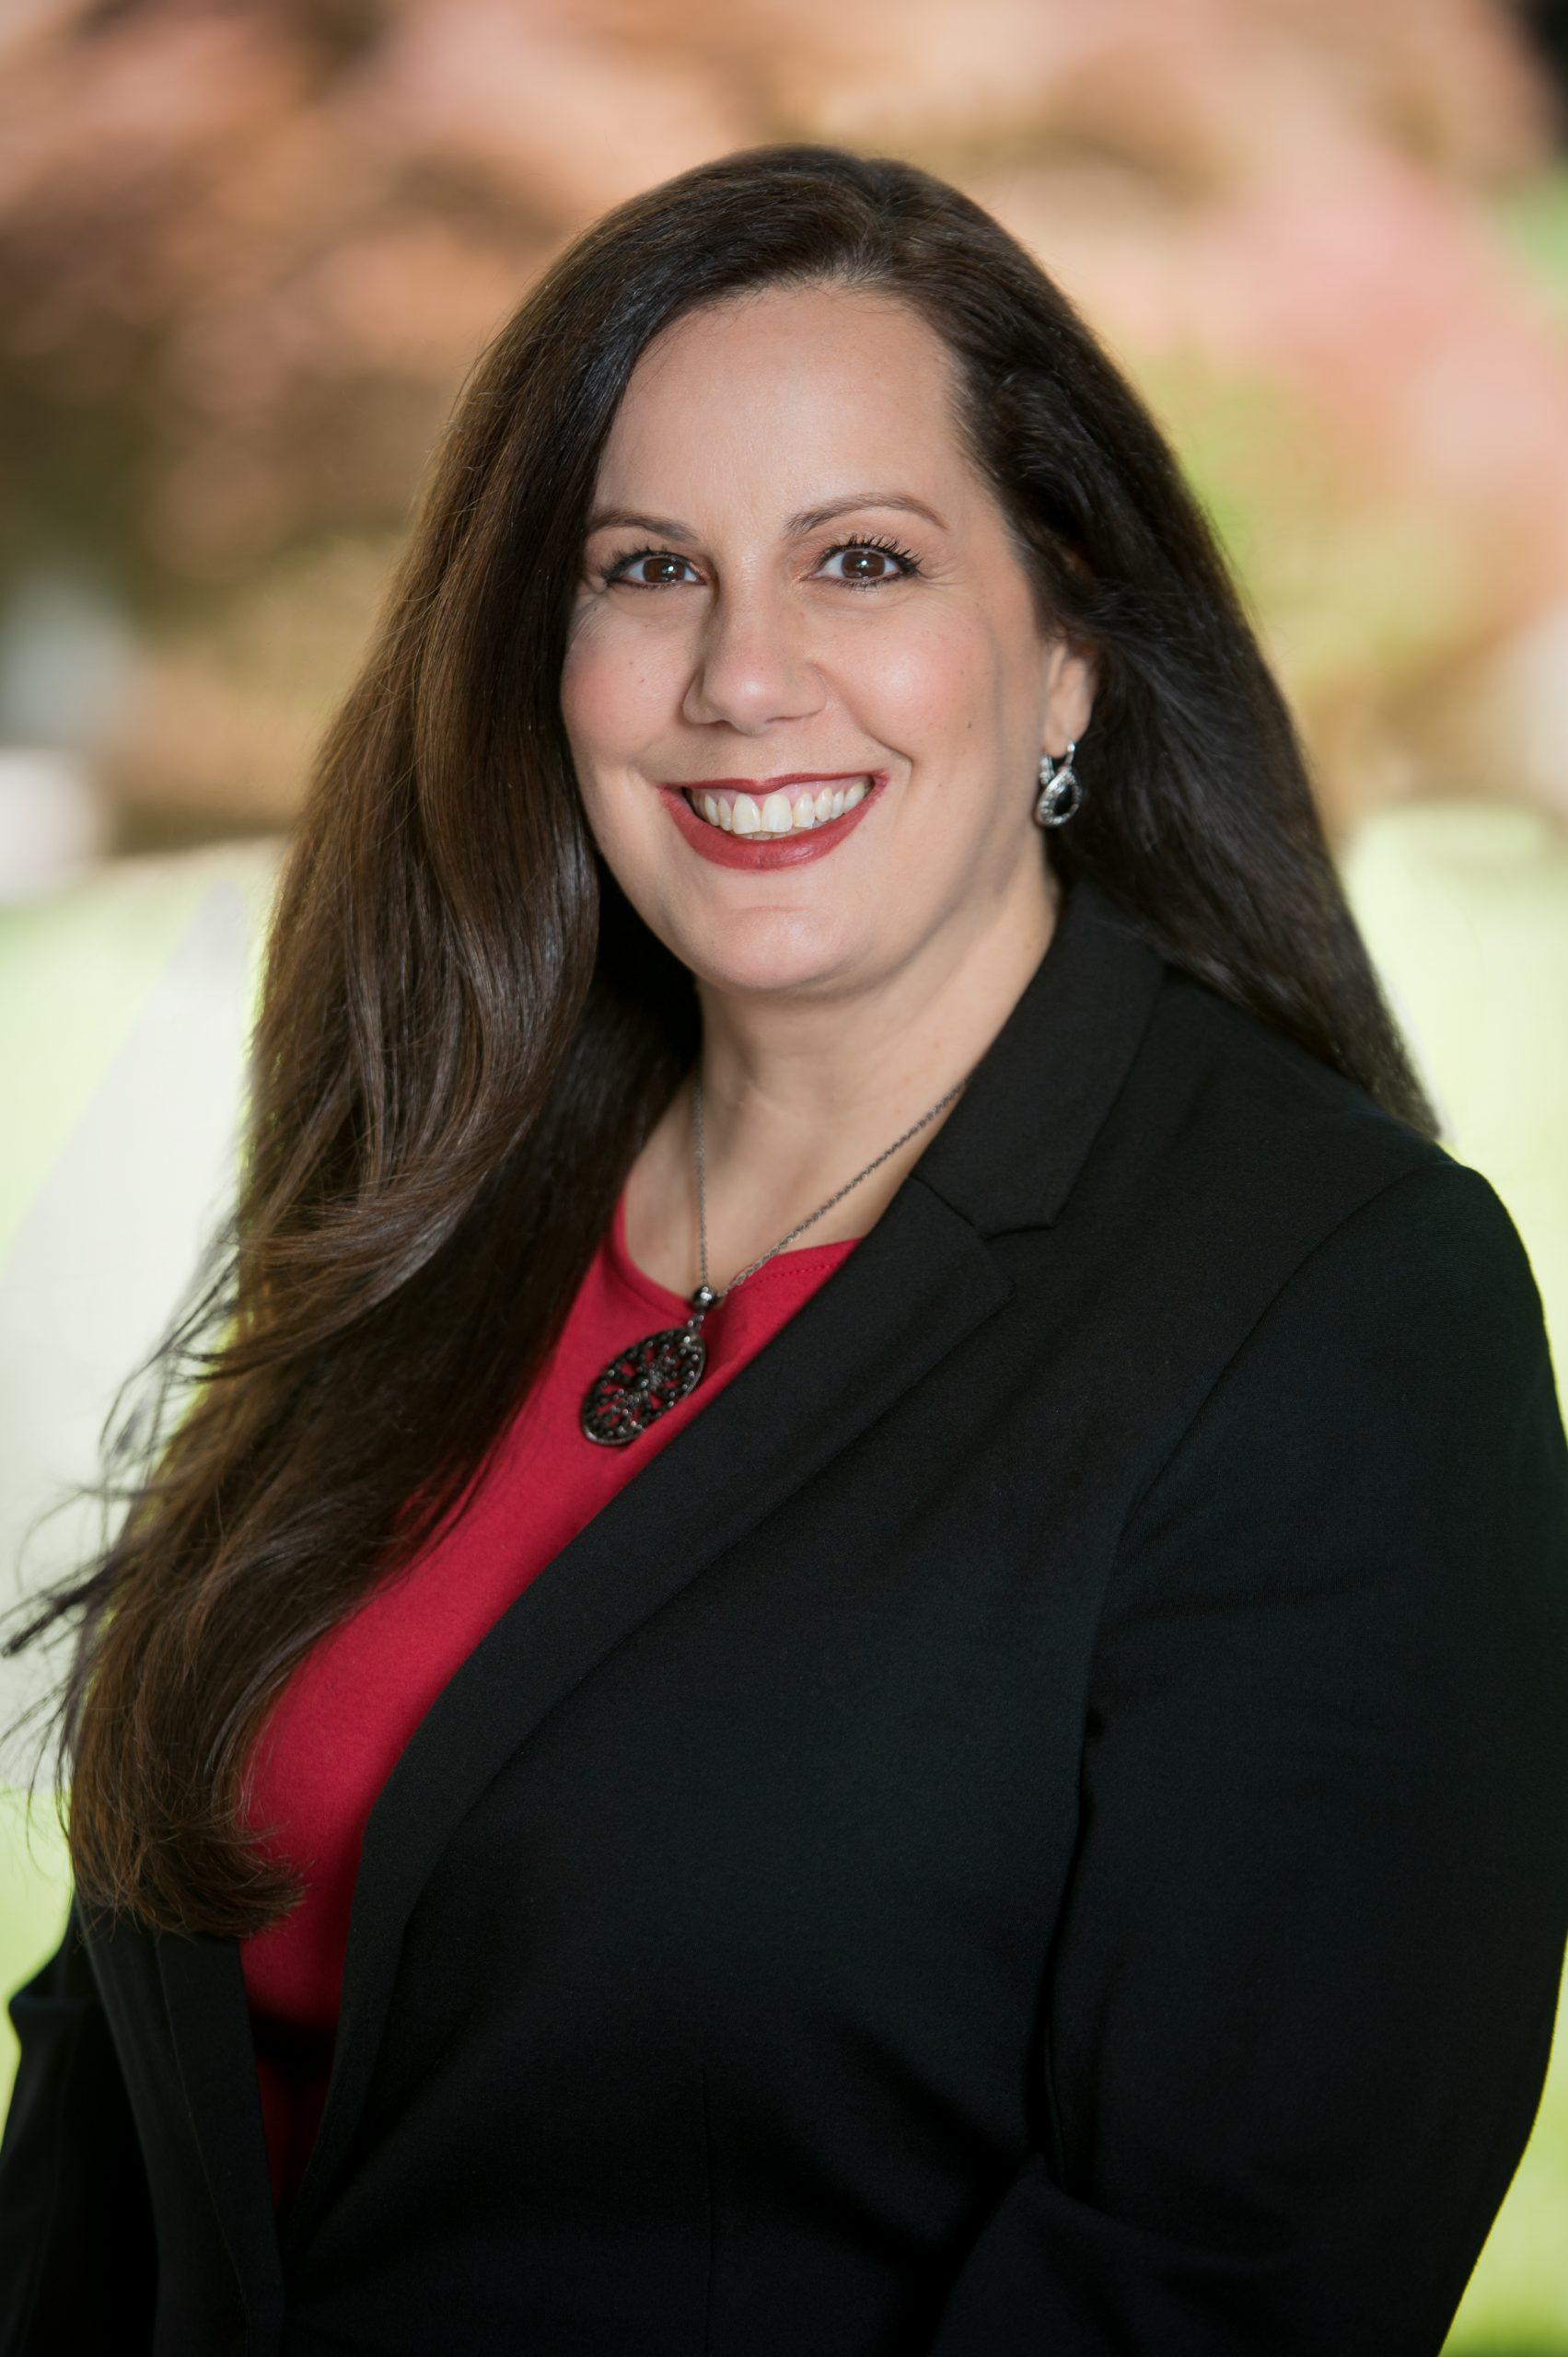 Christina Rae, Buzz Creators PR and Marketing